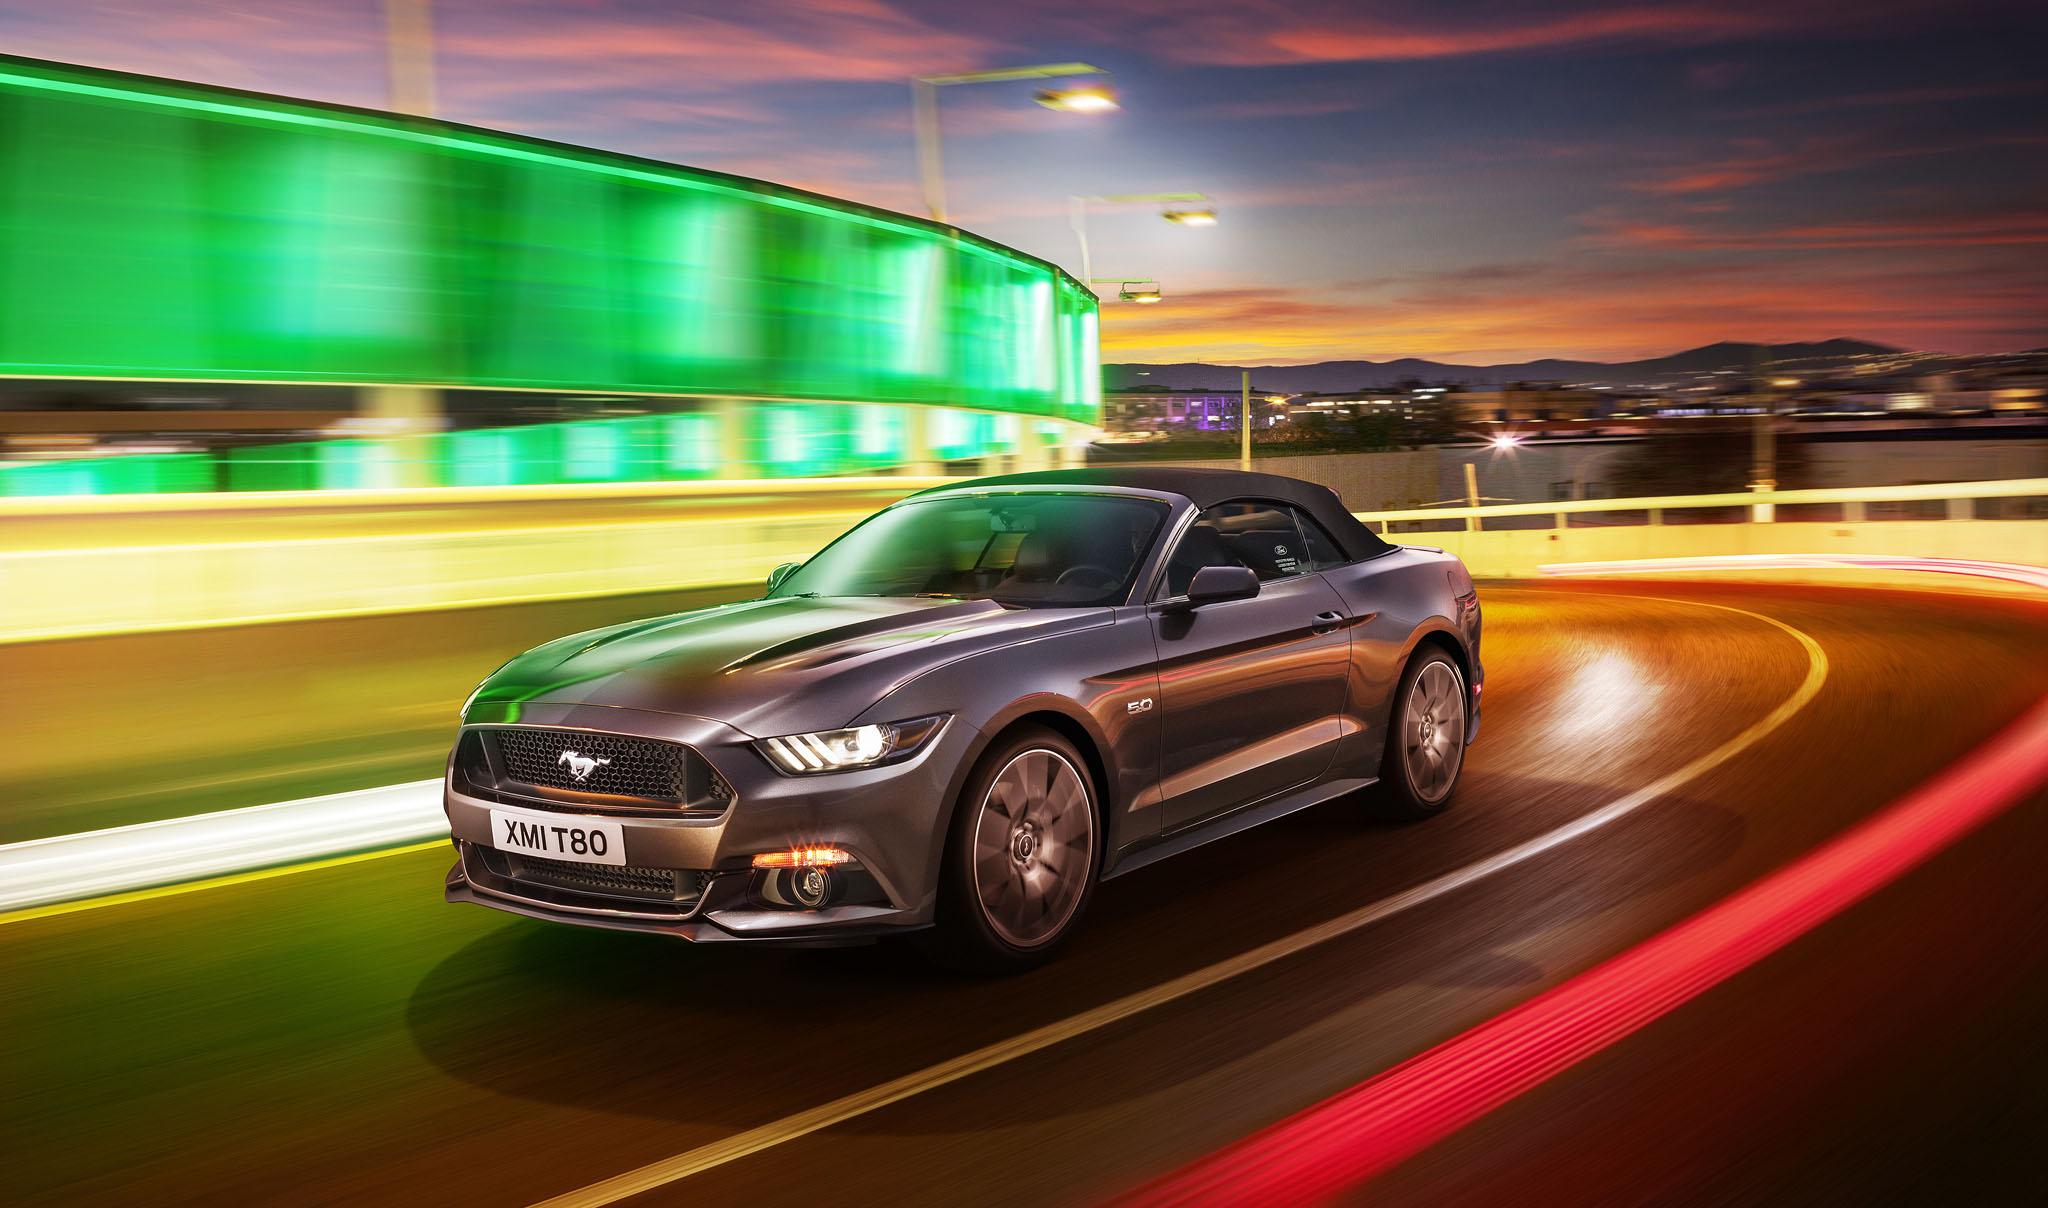 Mustang 12